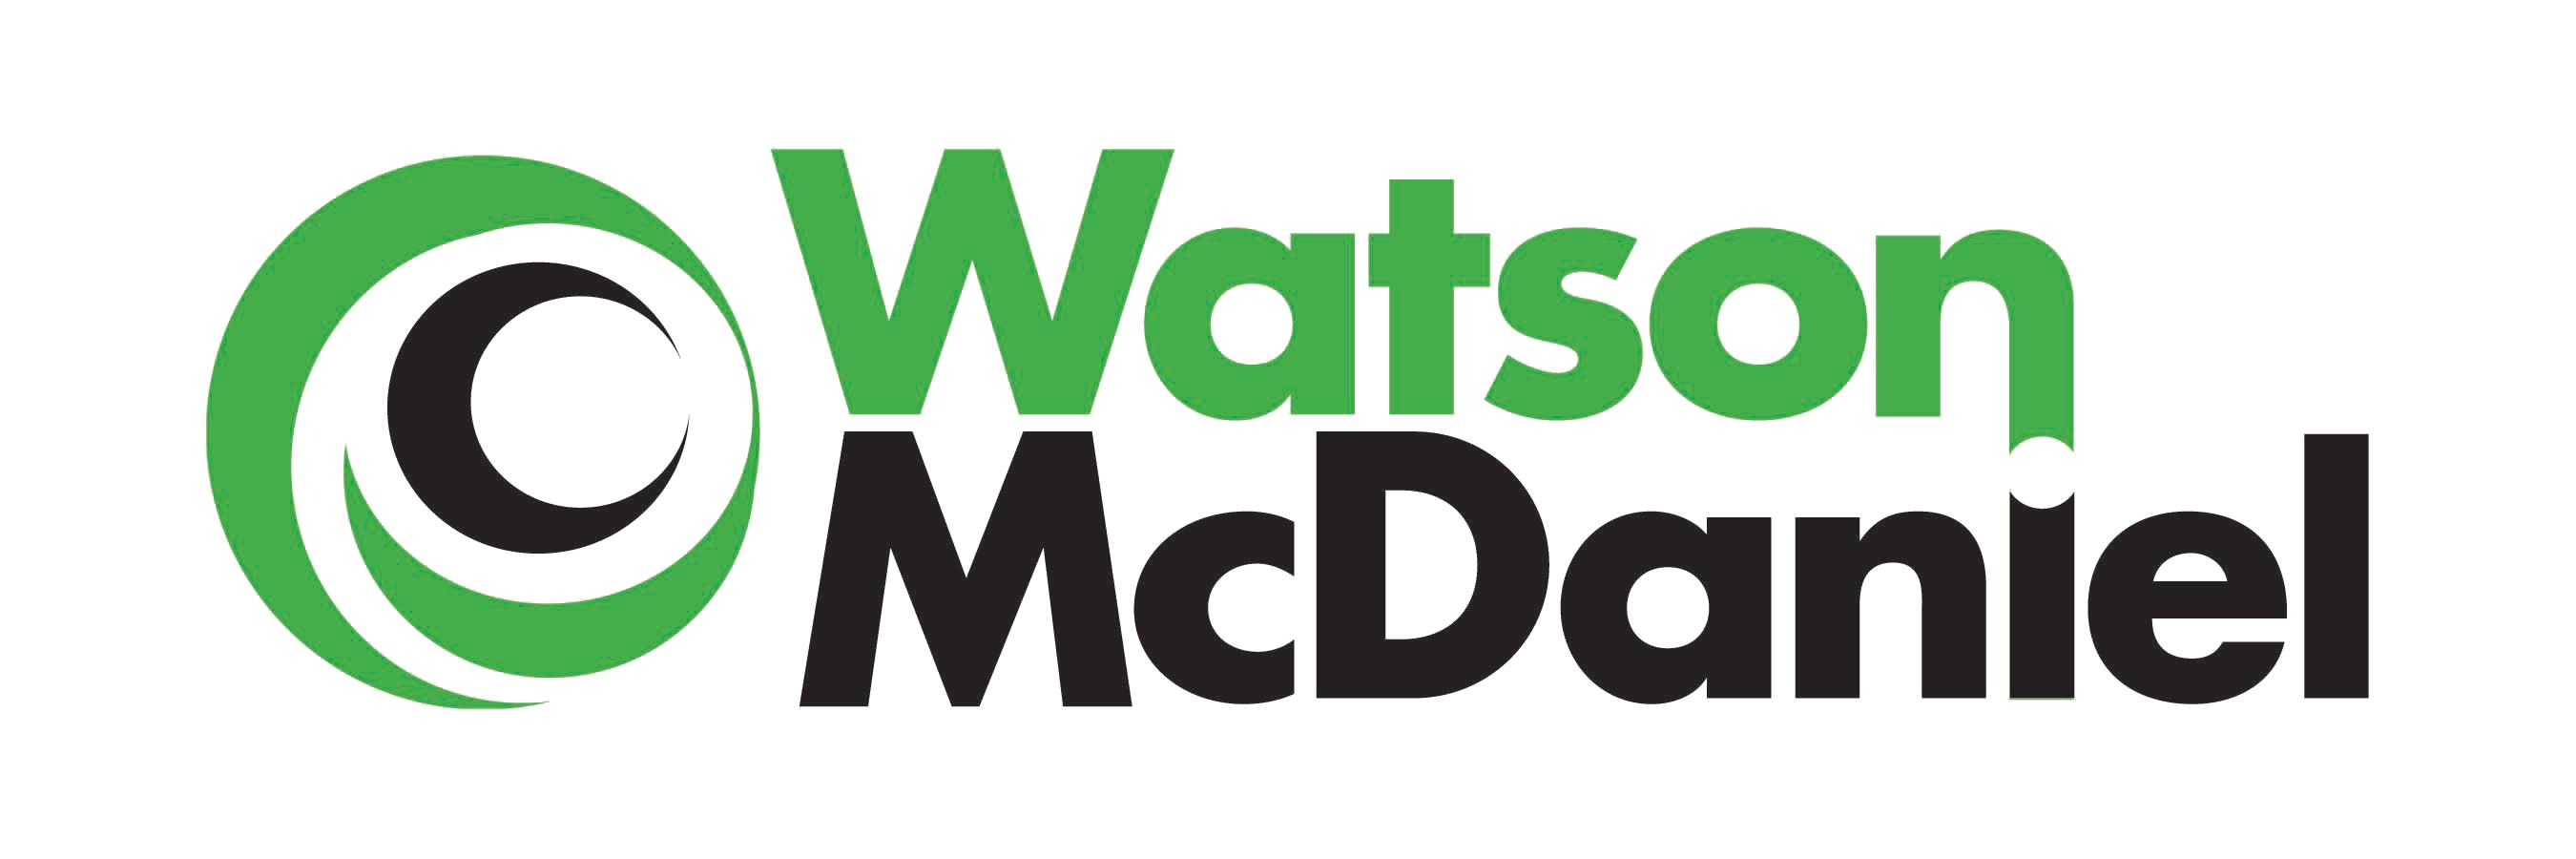 Watson-McDaniel-logo